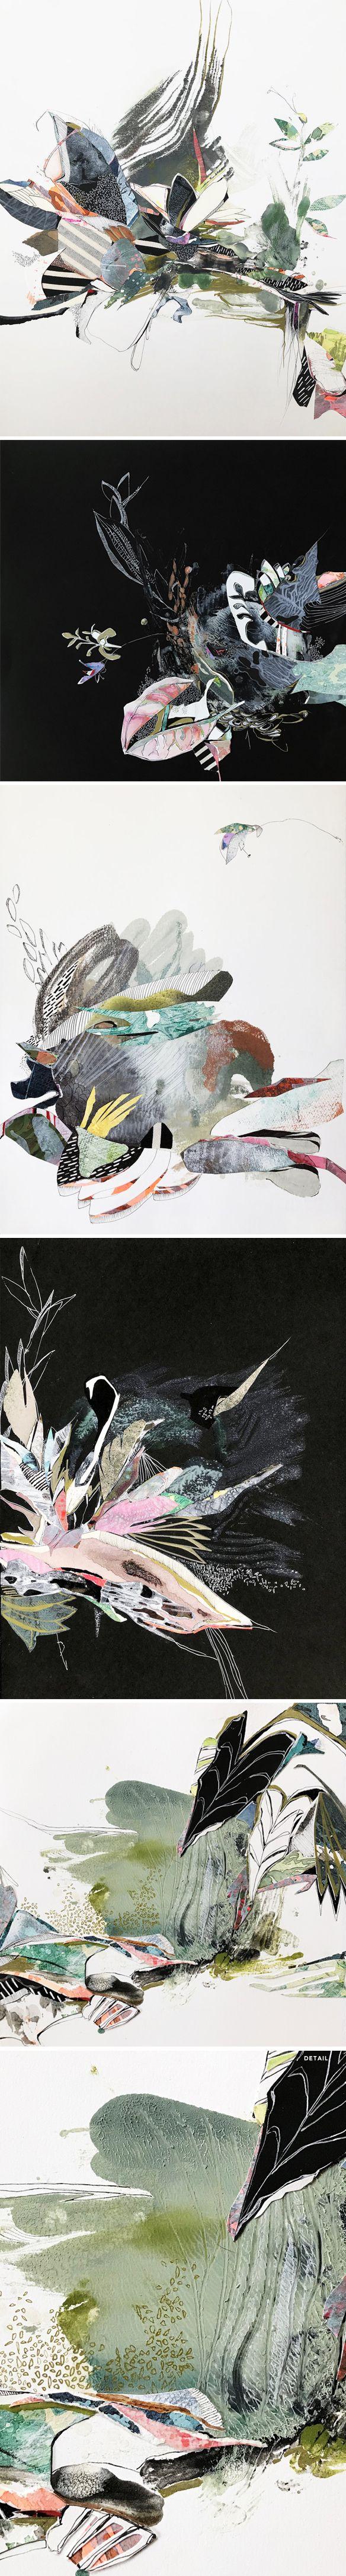 mixed media by kaylee dalton <3 #contemporaryart #mixedmedia #botanical